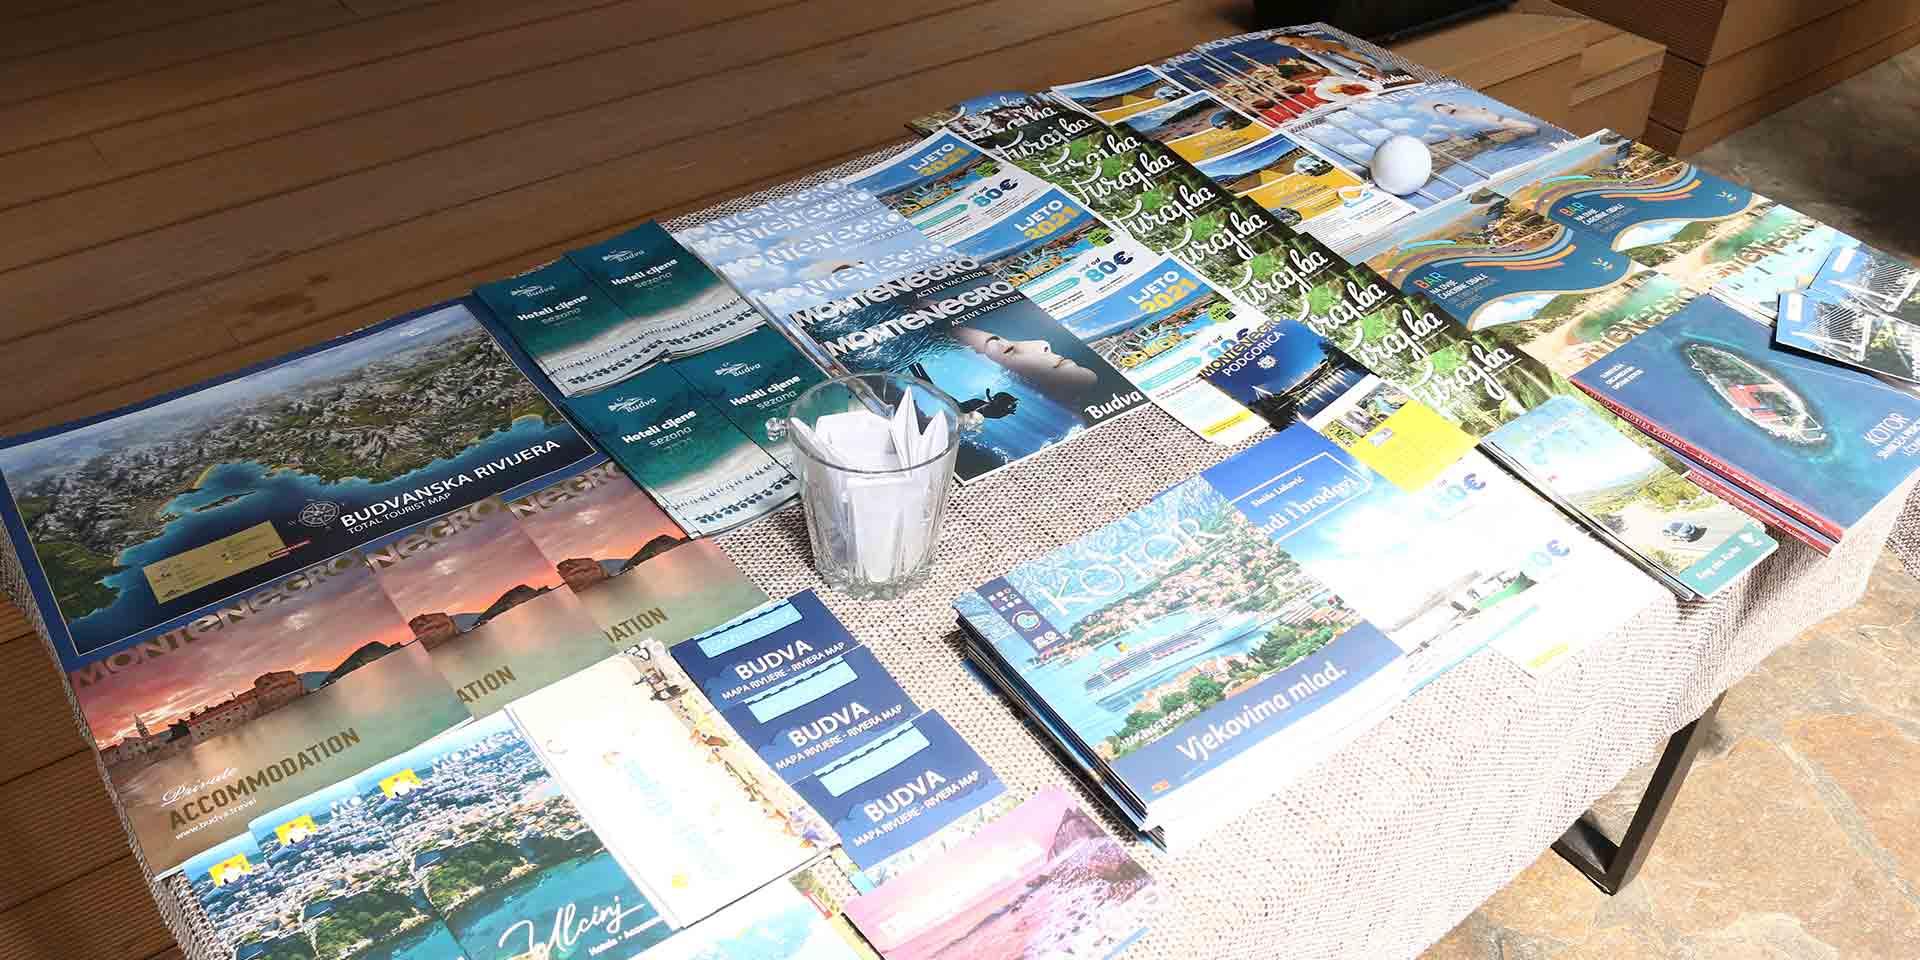 budva-apartments budva-beach budva-registration-fee budva-yacht budva-hotels